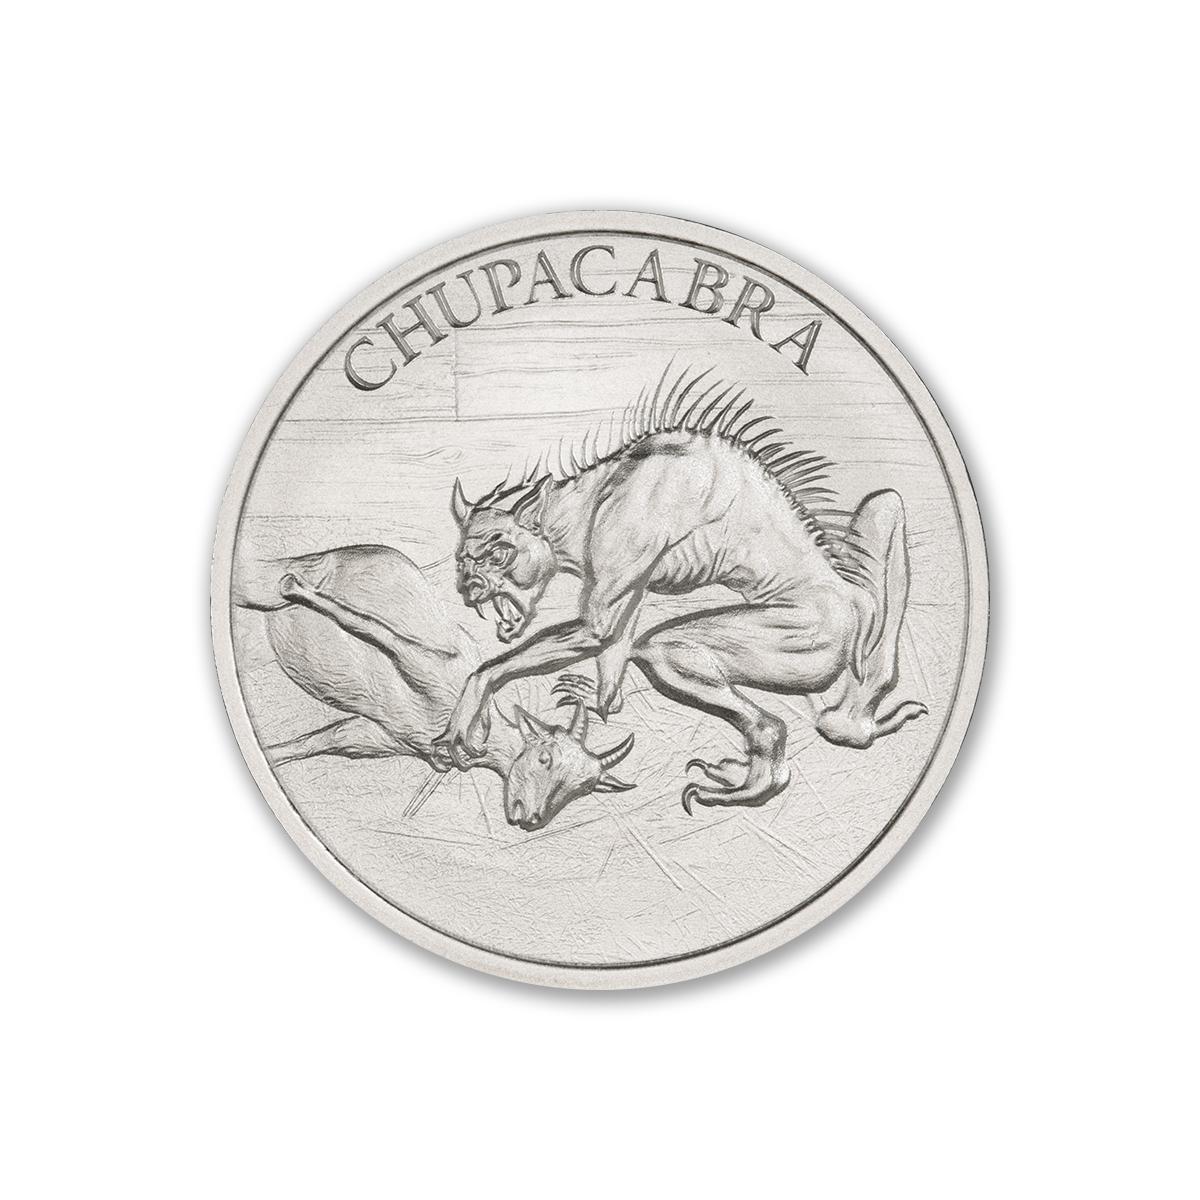 CHUPACABRA – 1 TROY OUNCE – 39MM